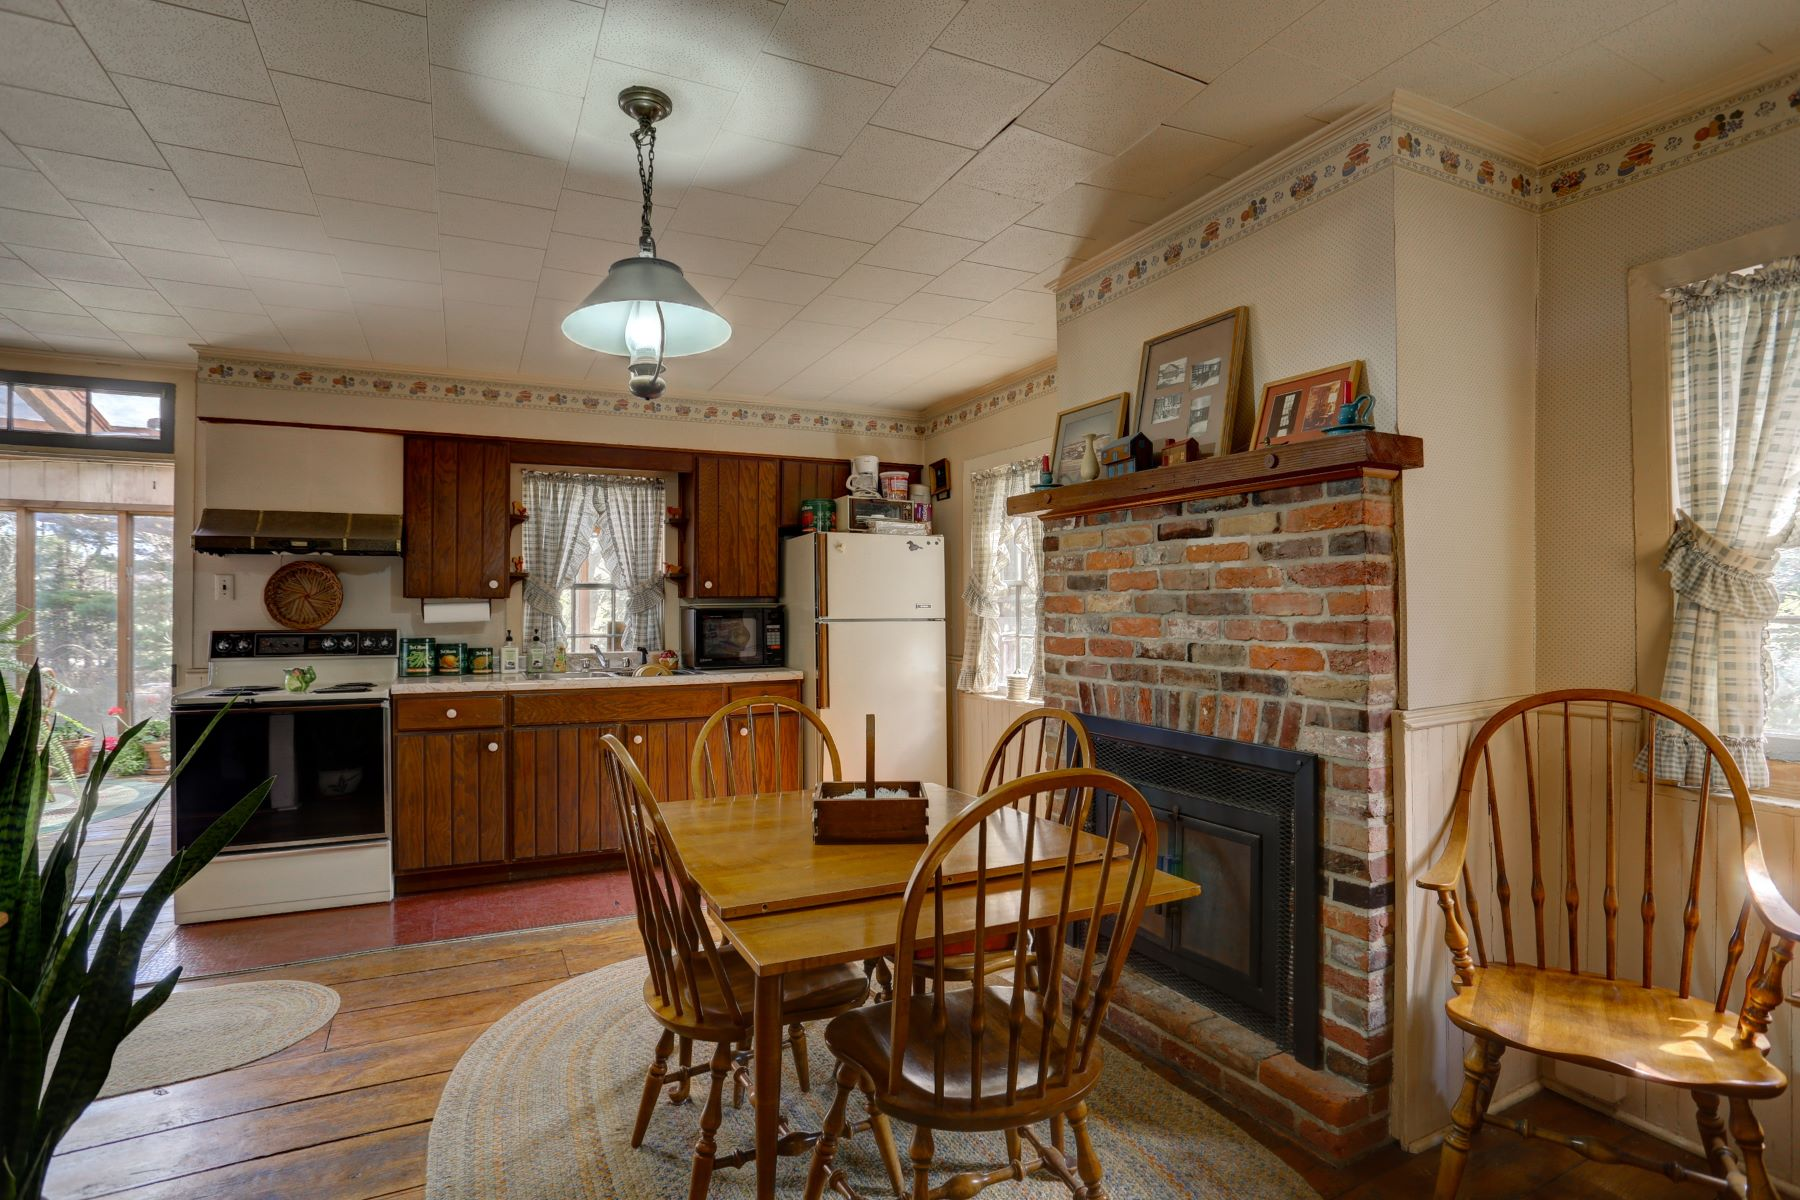 Additional photo for property listing at 14781 Boyer Rd 1 14781 Boyer Rd 1 Glen Rock, 宾夕法尼亚州 17327 美国